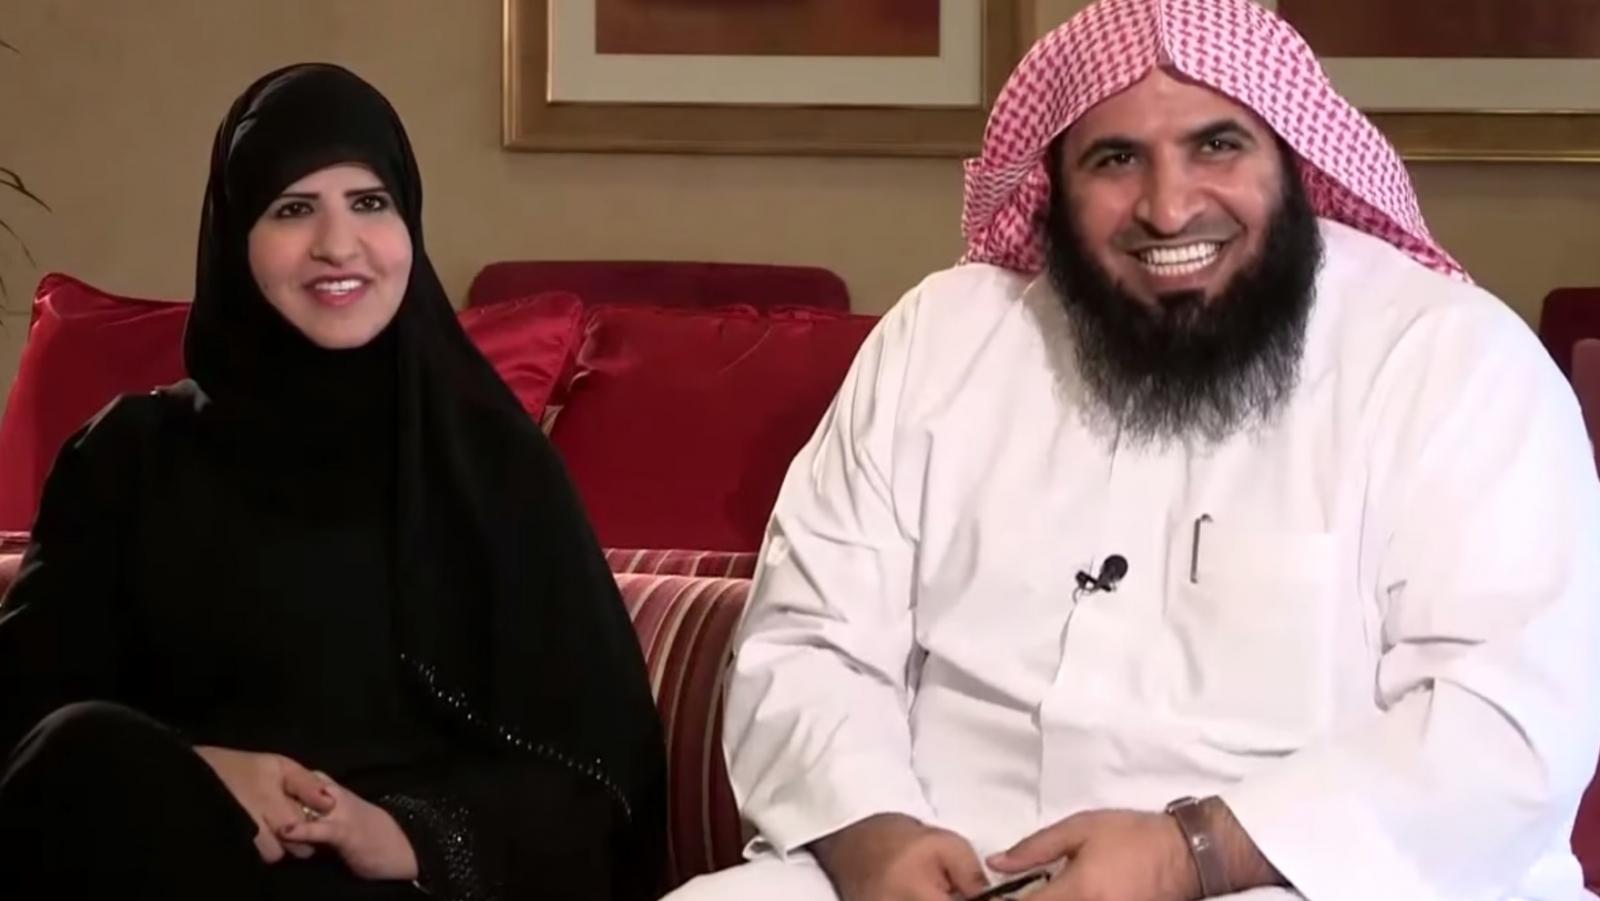 Saudi cleric Sheikh Ahmad al-Ghamedi's wife face uncovered TV